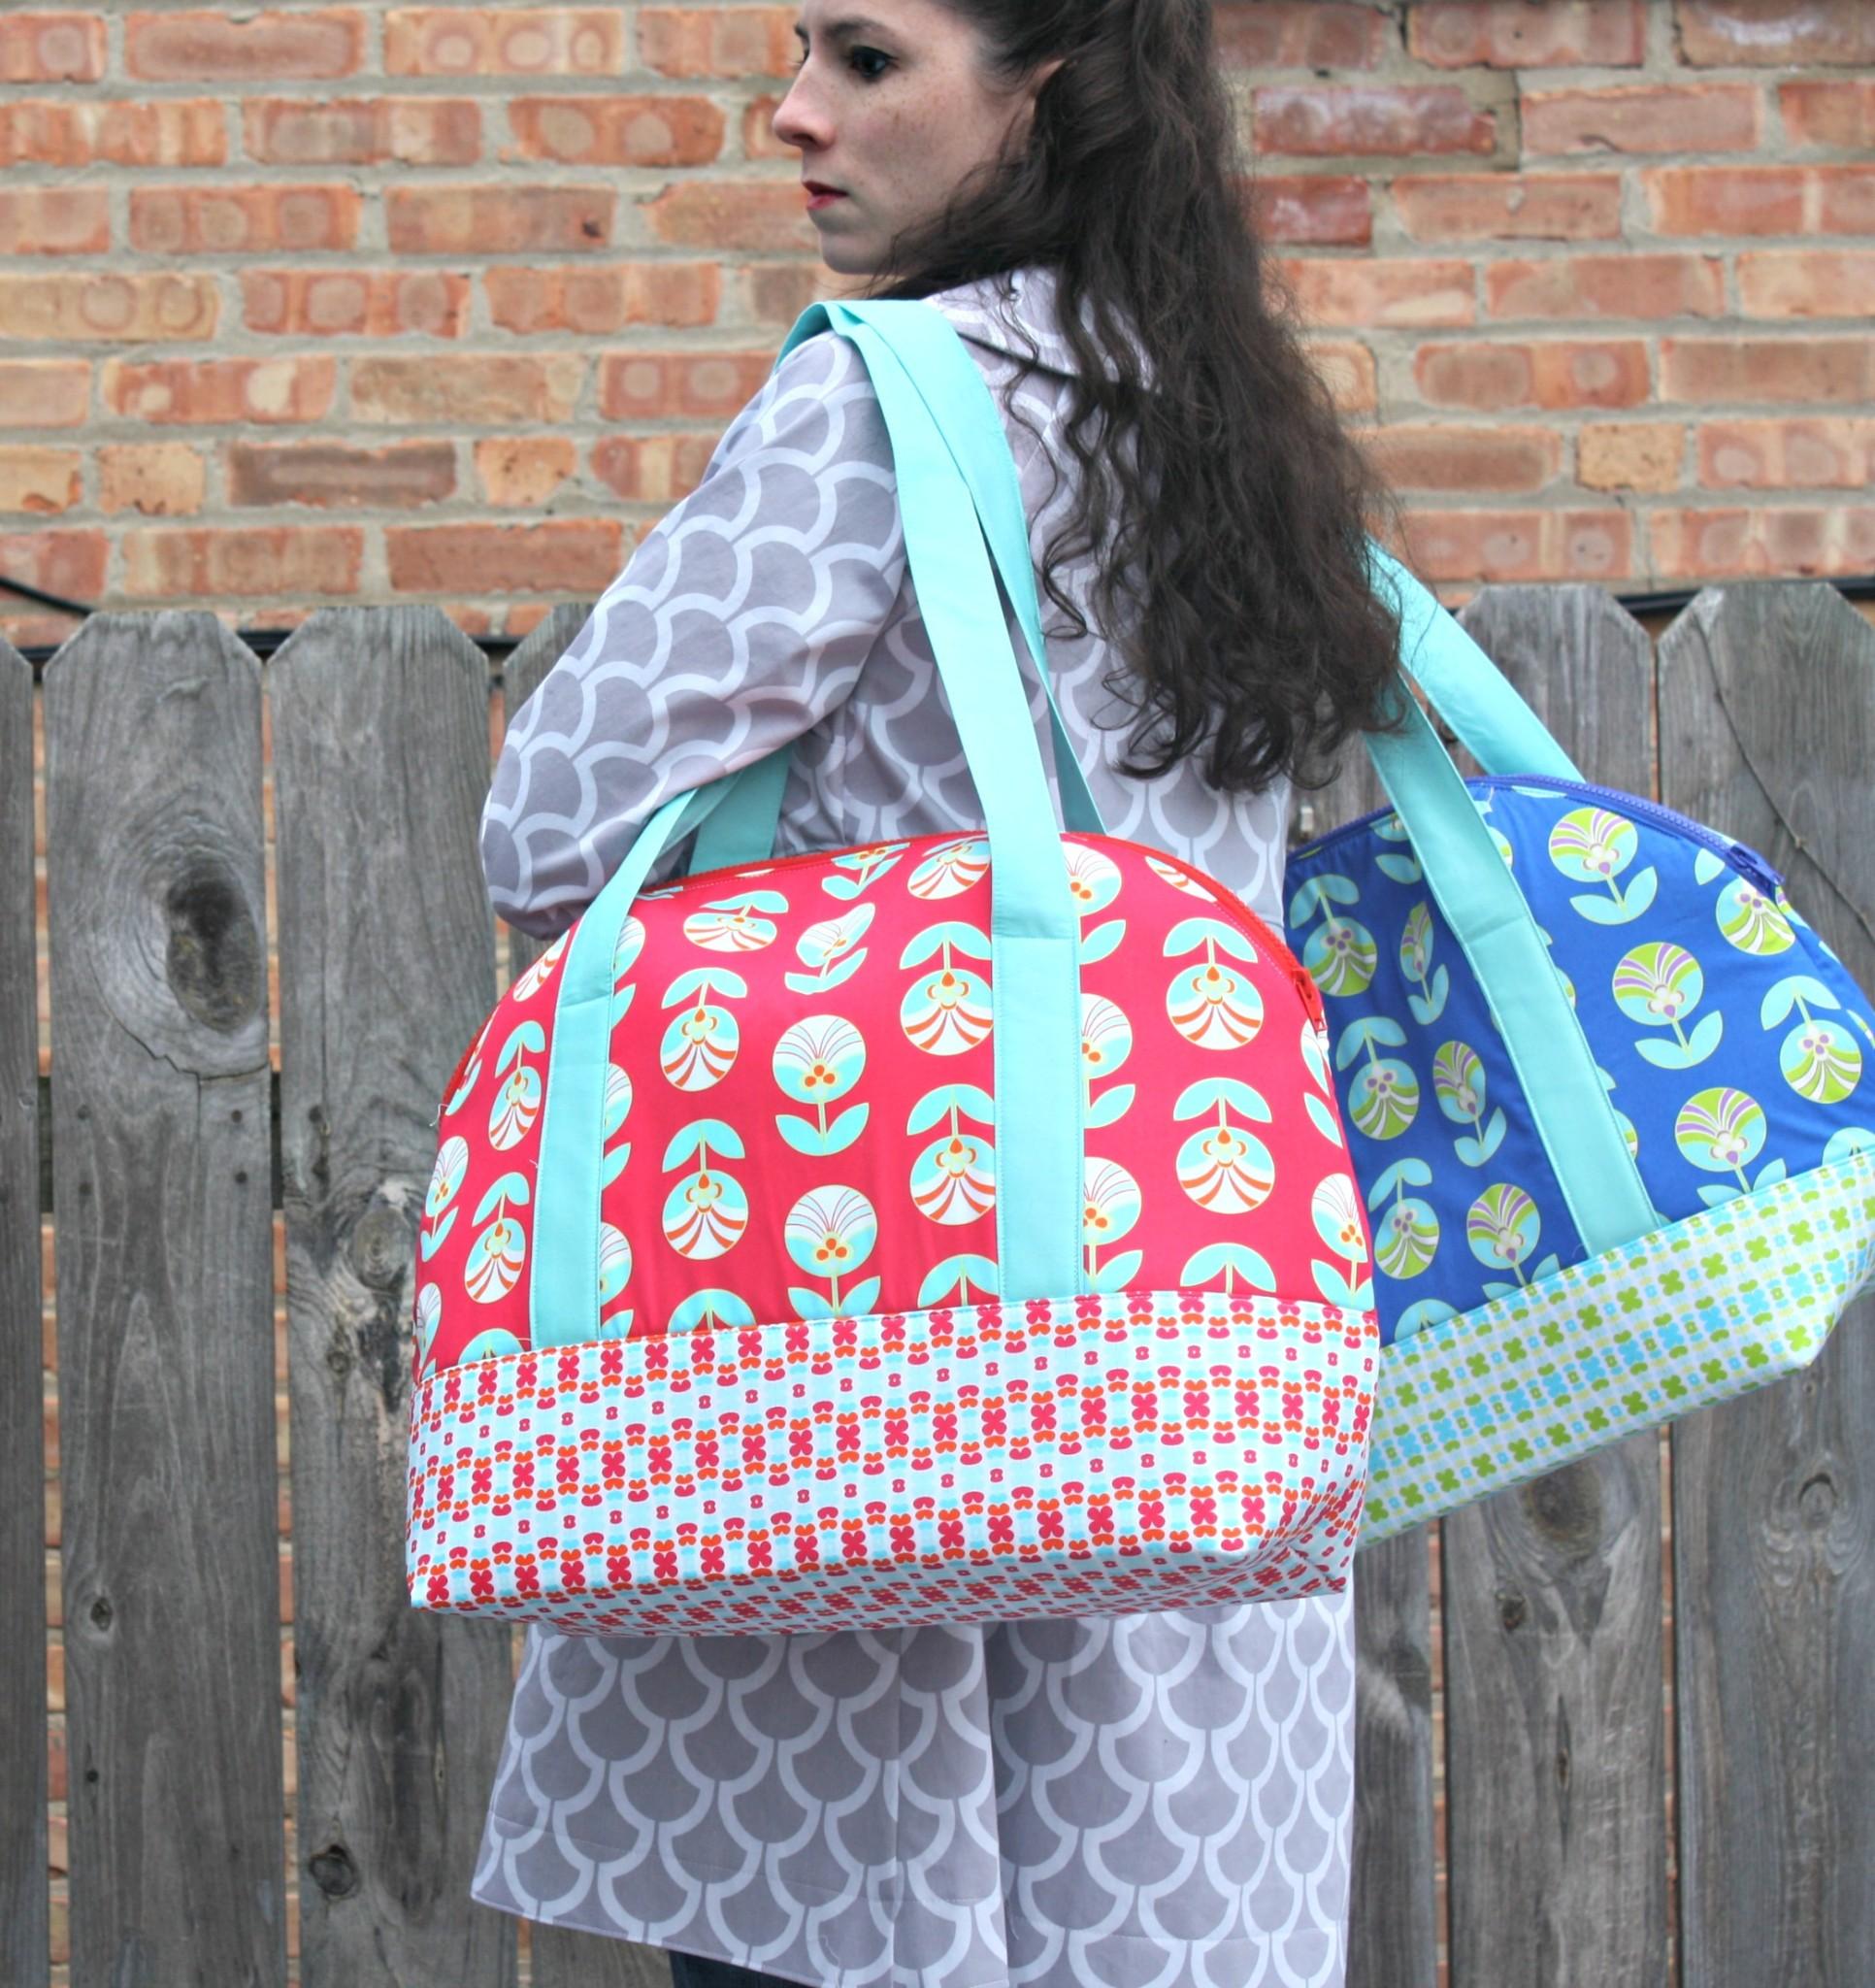 Aeroplane bag sew sweetness sew sweetness aeroplane bags 6 bag1 jeuxipadfo Image collections